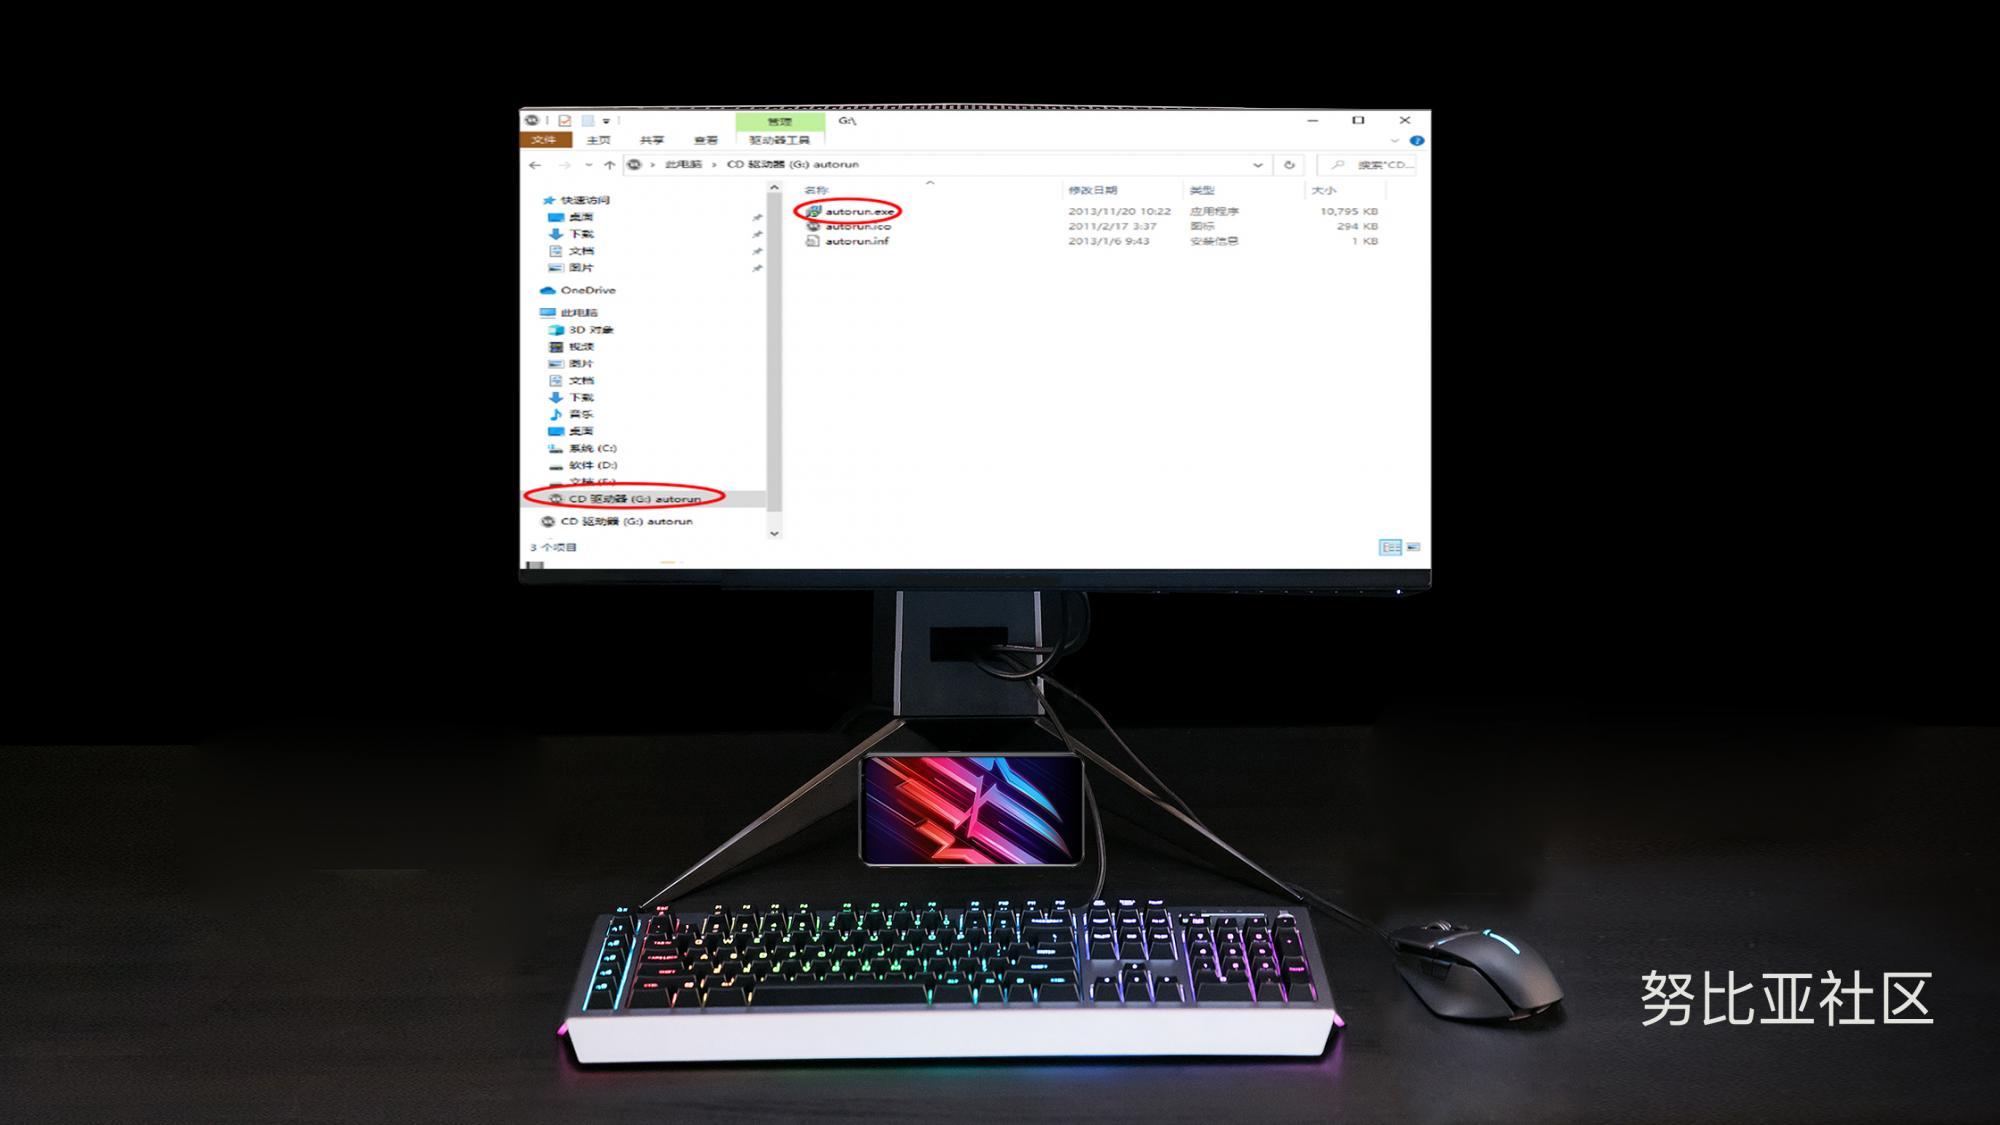 USB直连投屏3.jpg